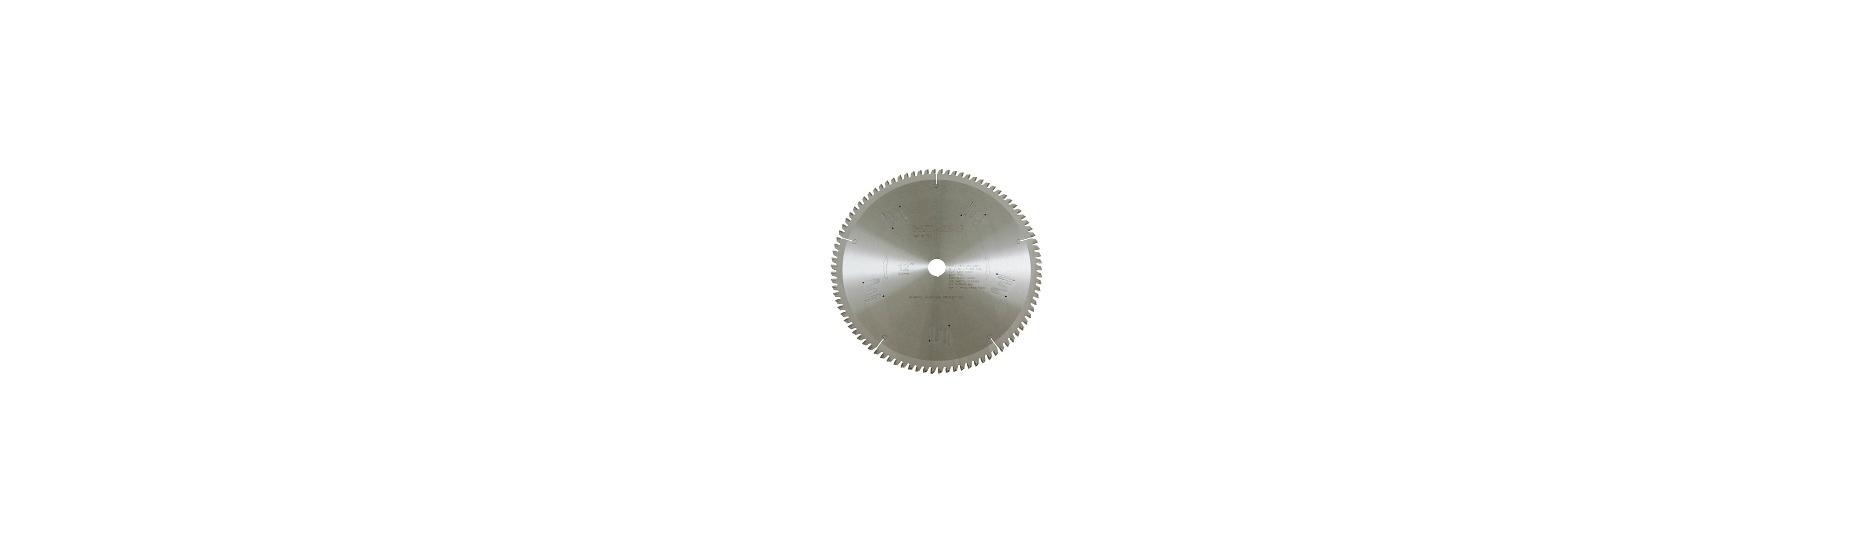 Discos de Metal Duro Aluminio